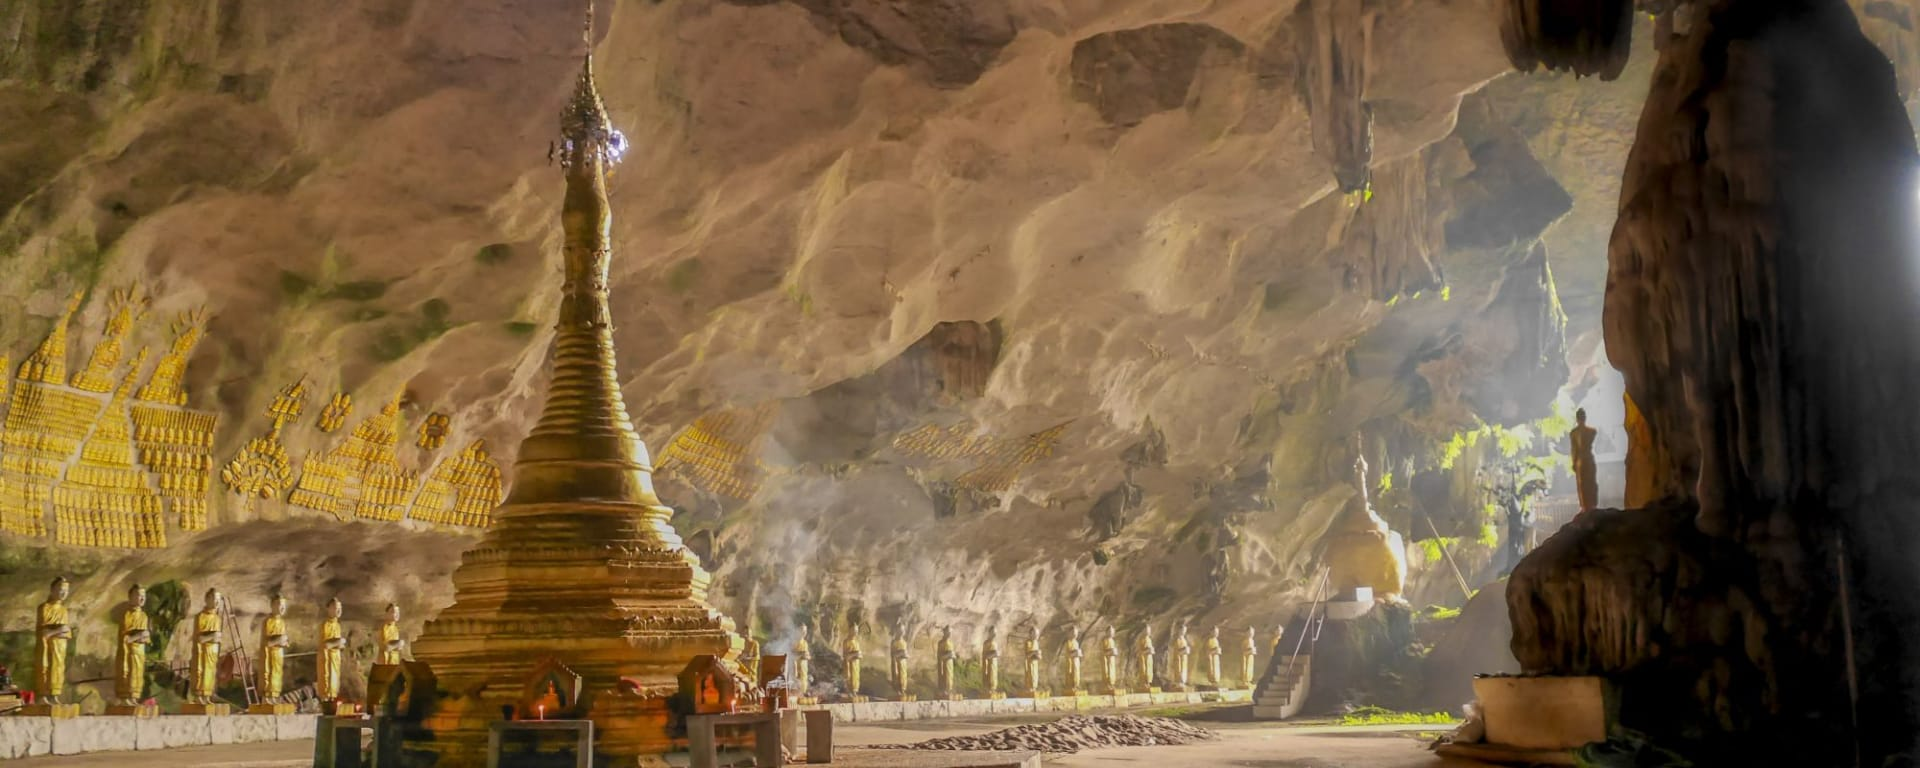 Fascination du sud du Myanmar de Yangon: Saddar Cave at Hpa-An